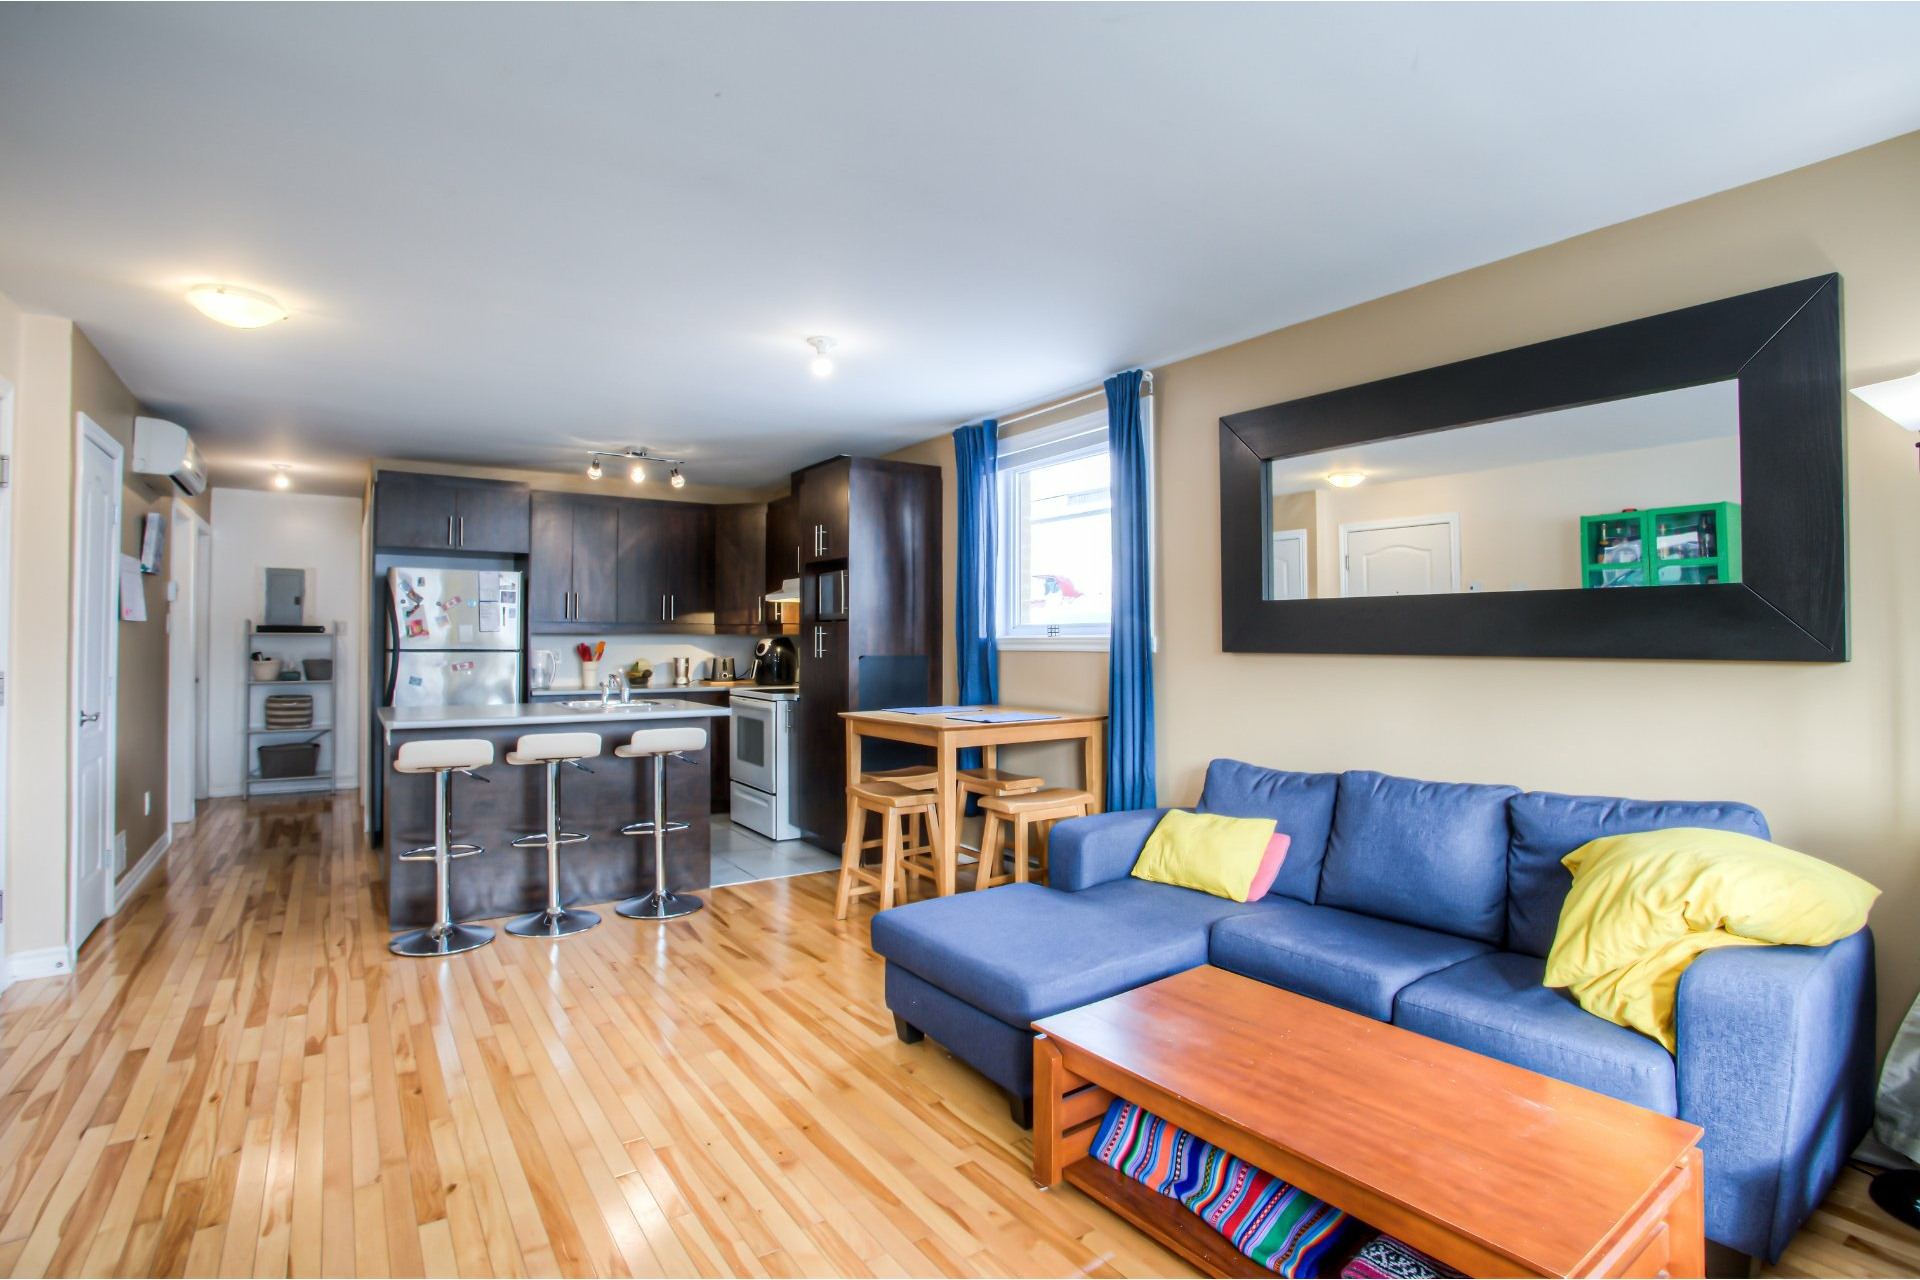 image 6 - Departamento Para alquiler Villeray/Saint-Michel/Parc-Extension Montréal  - 5 habitaciones